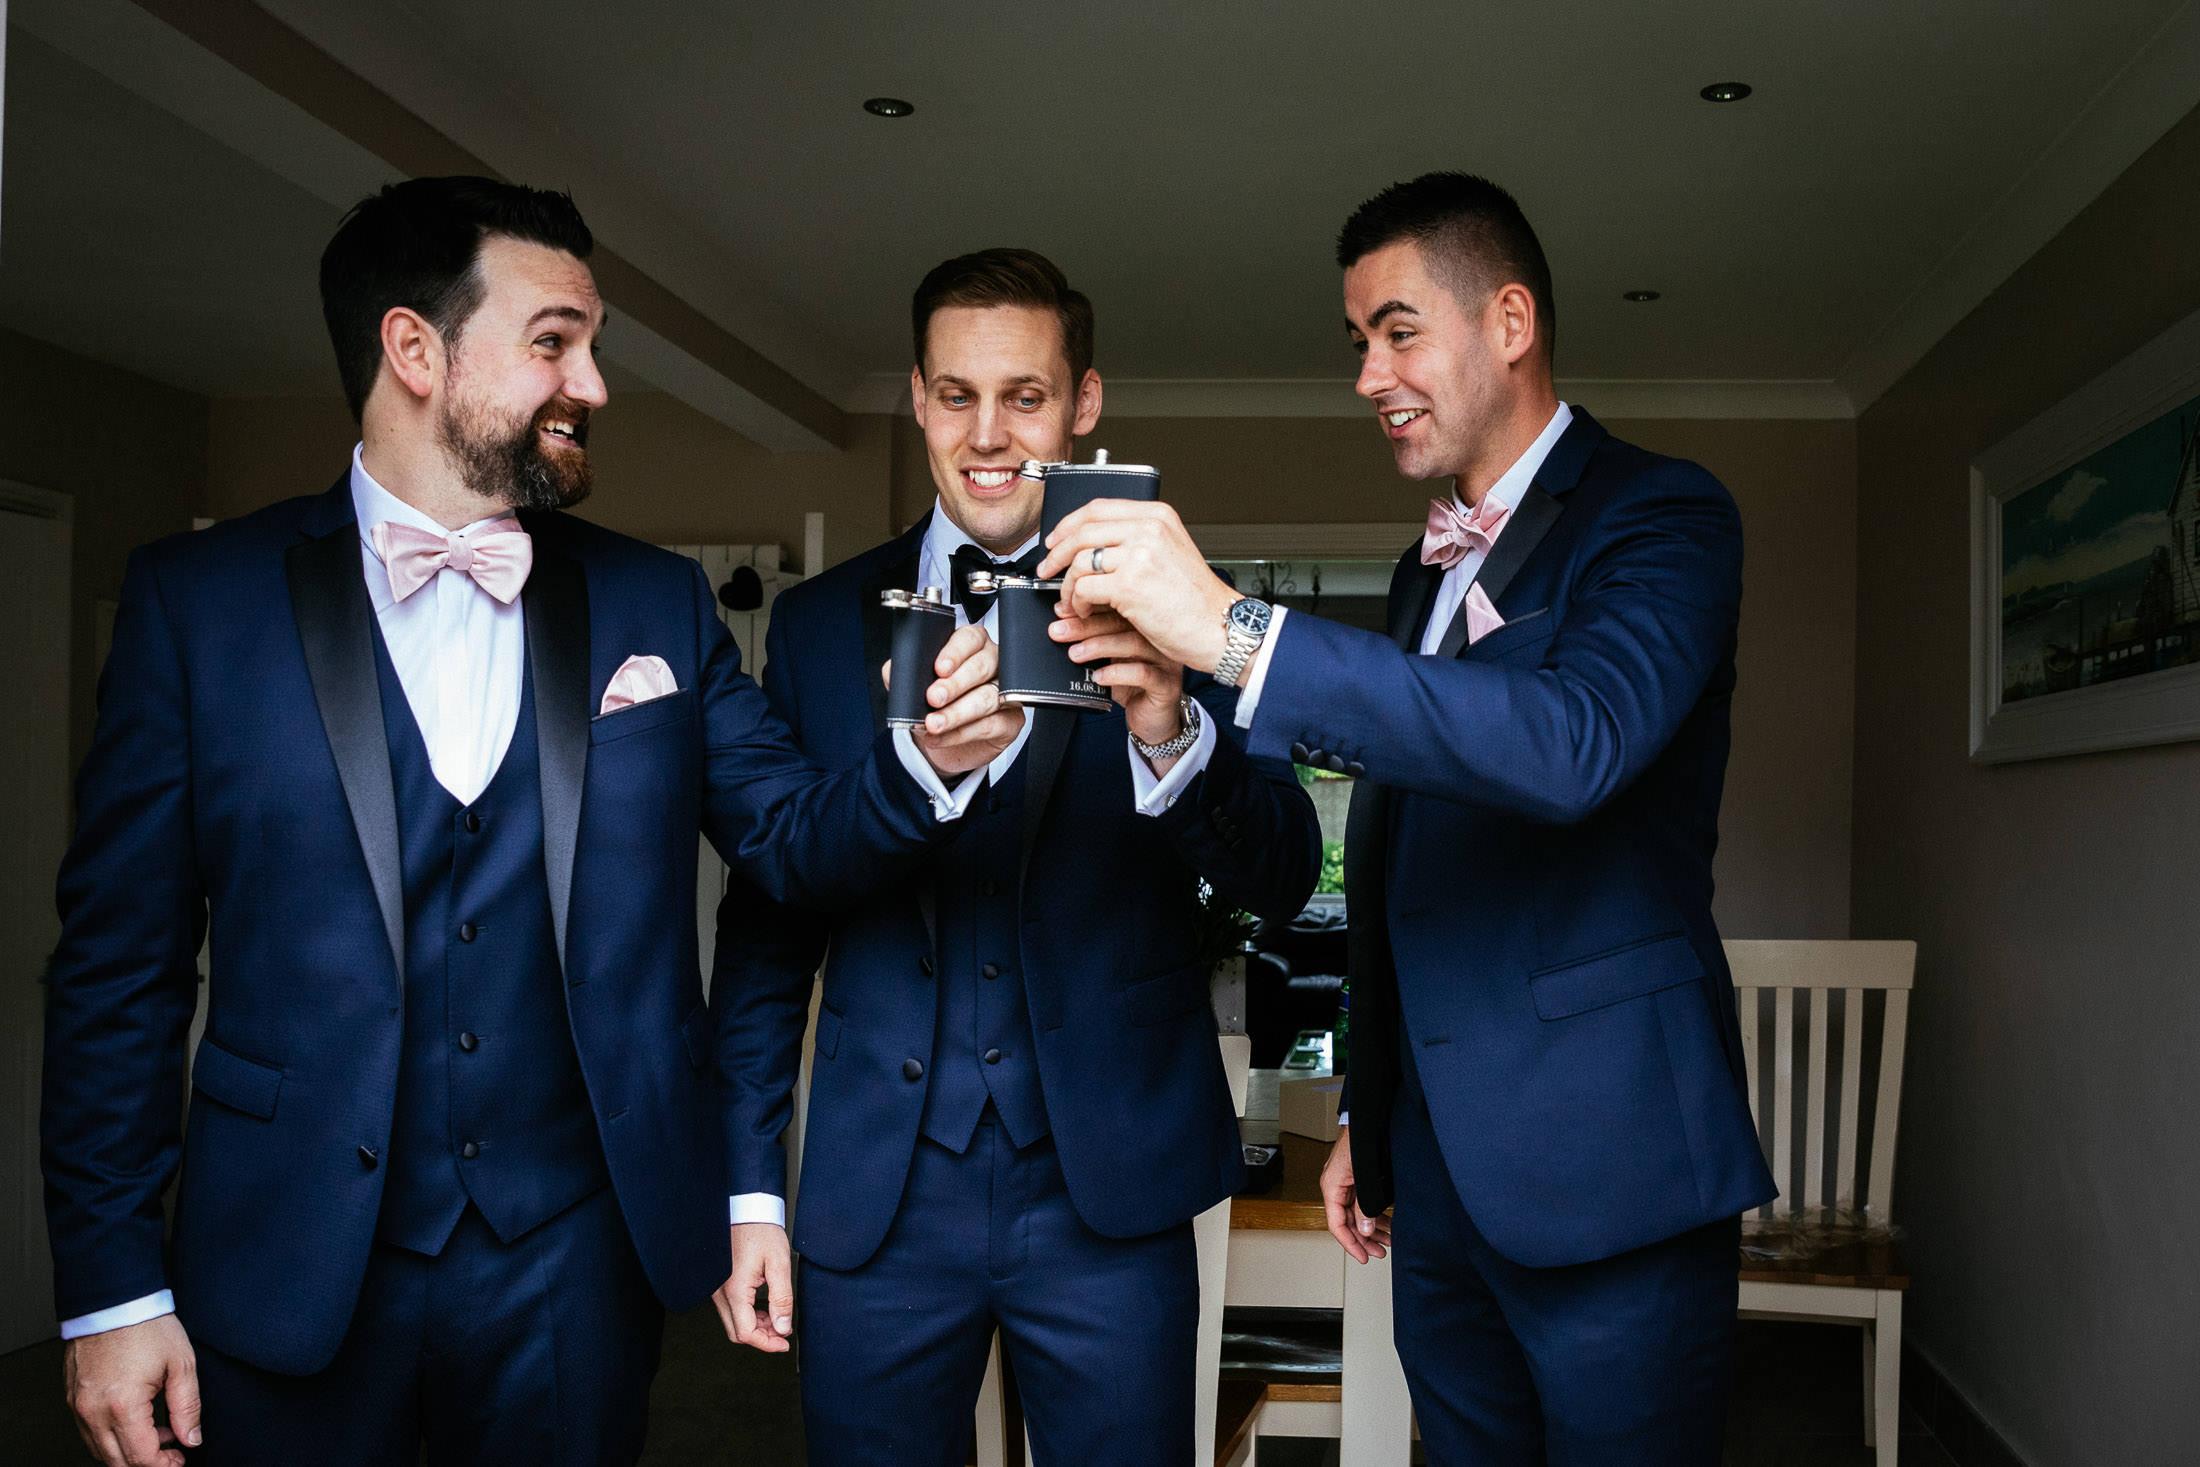 Knightsbrook Hotel Trim Castle Wedding Photographer 20